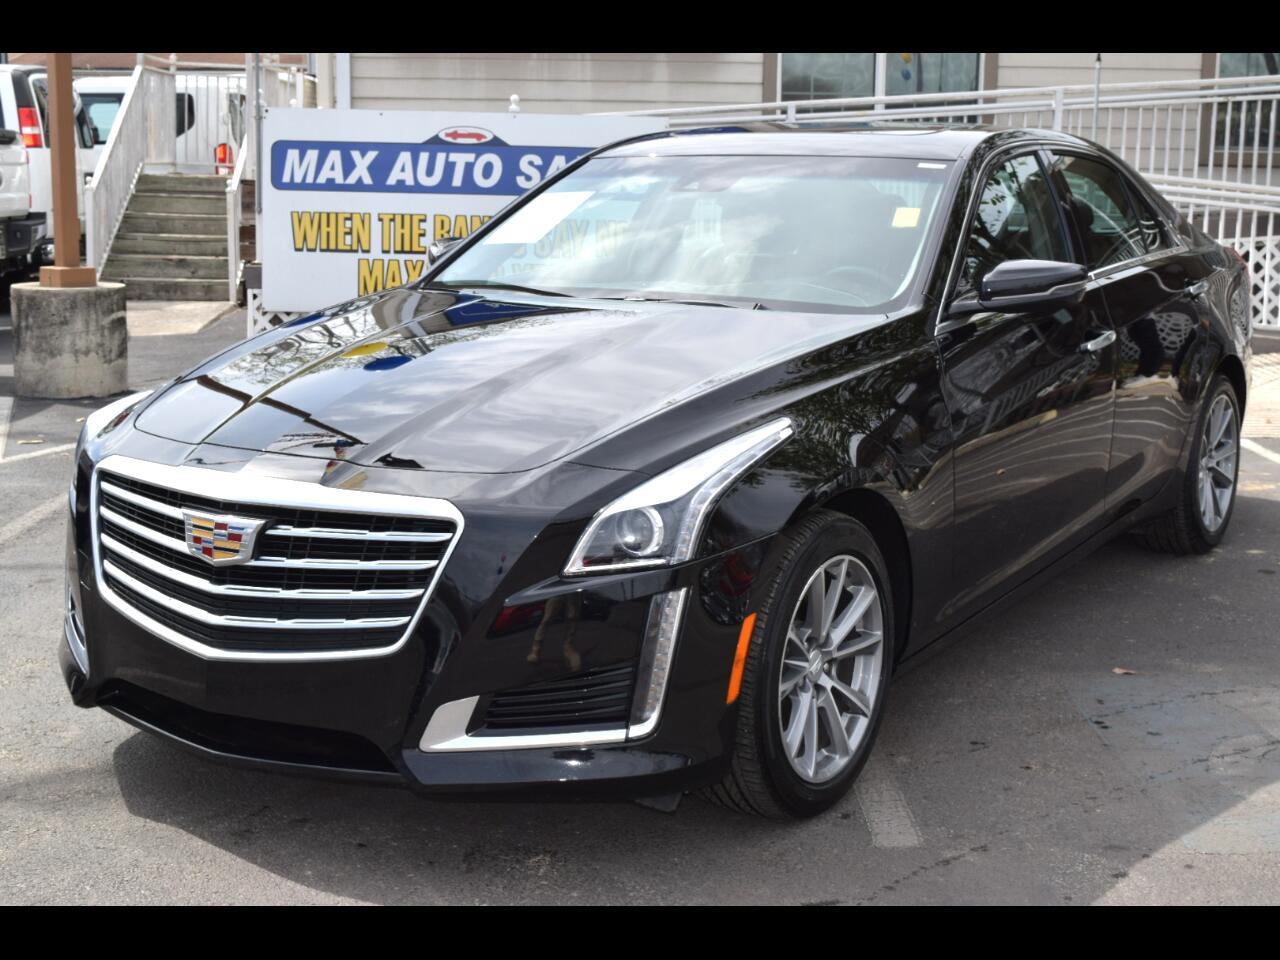 2019 Cadillac CTS Sedan 4dr Sdn 3.6L Luxury RWD